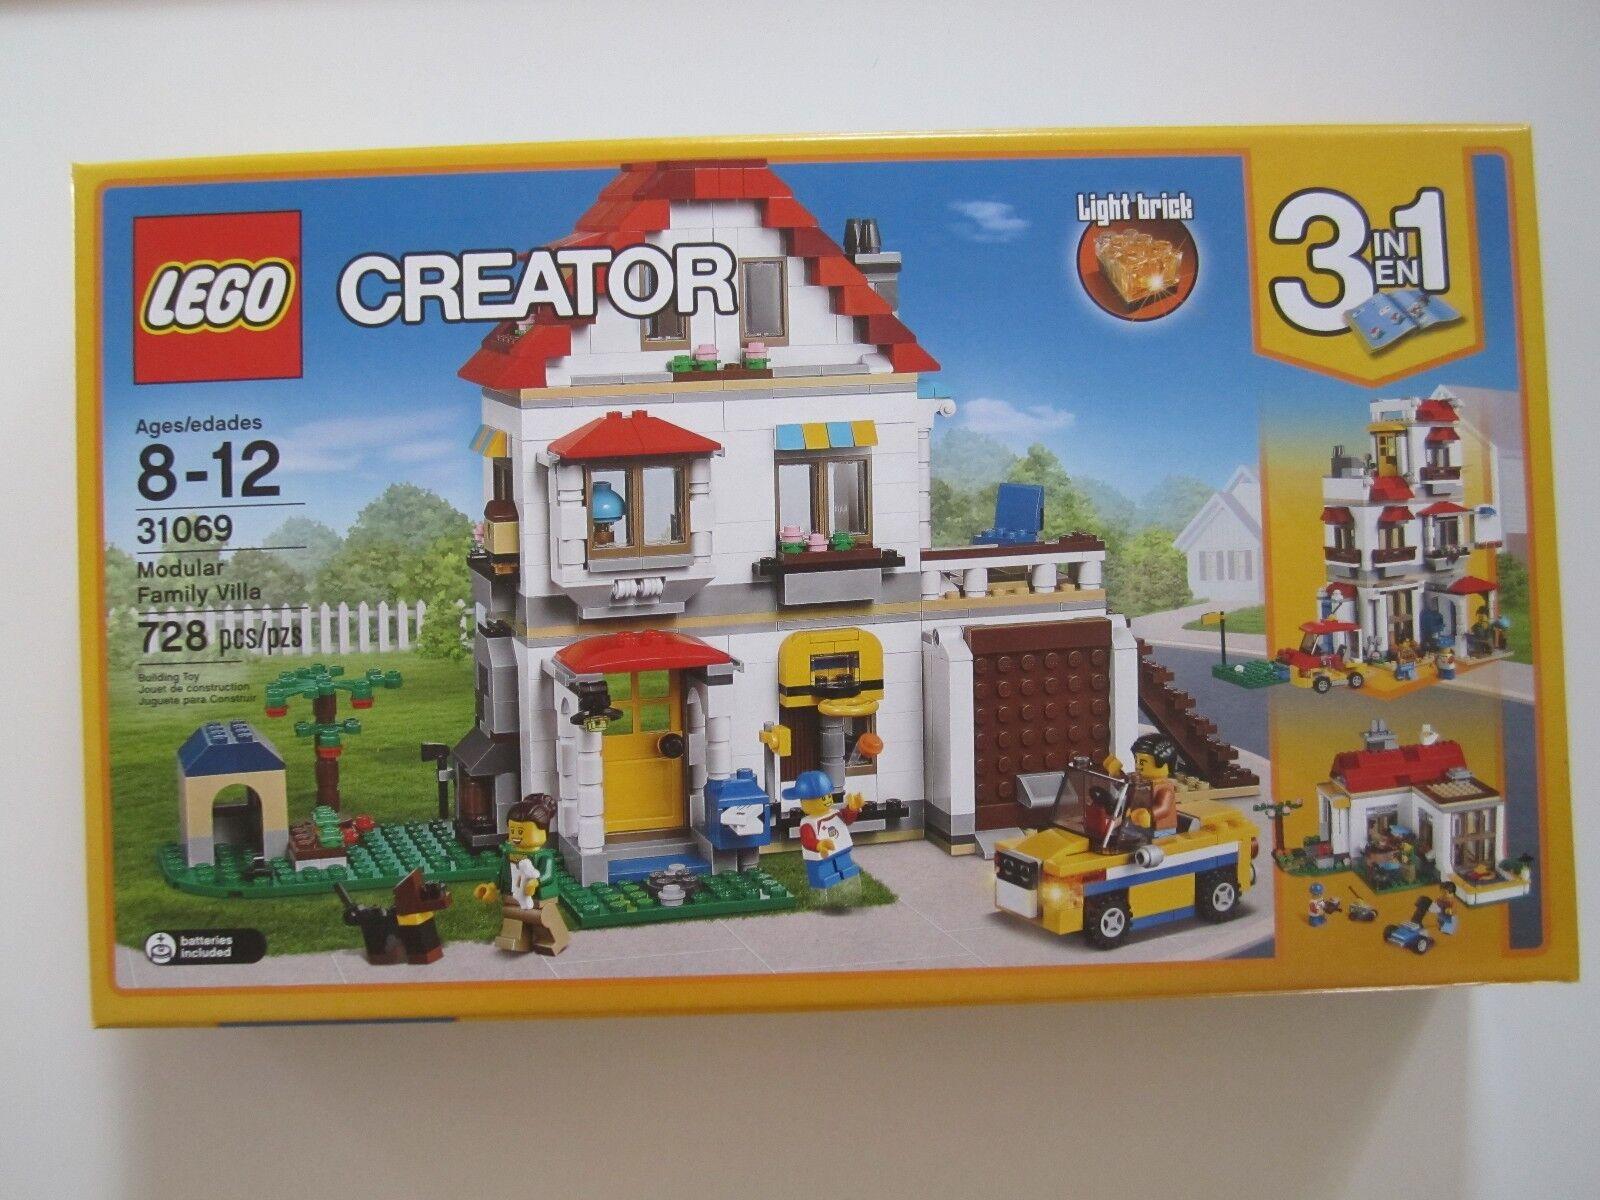 31069 LEGO Creator Modular Family Villa 728Pieces 3in1 Factory Sealed Nuovo in Box